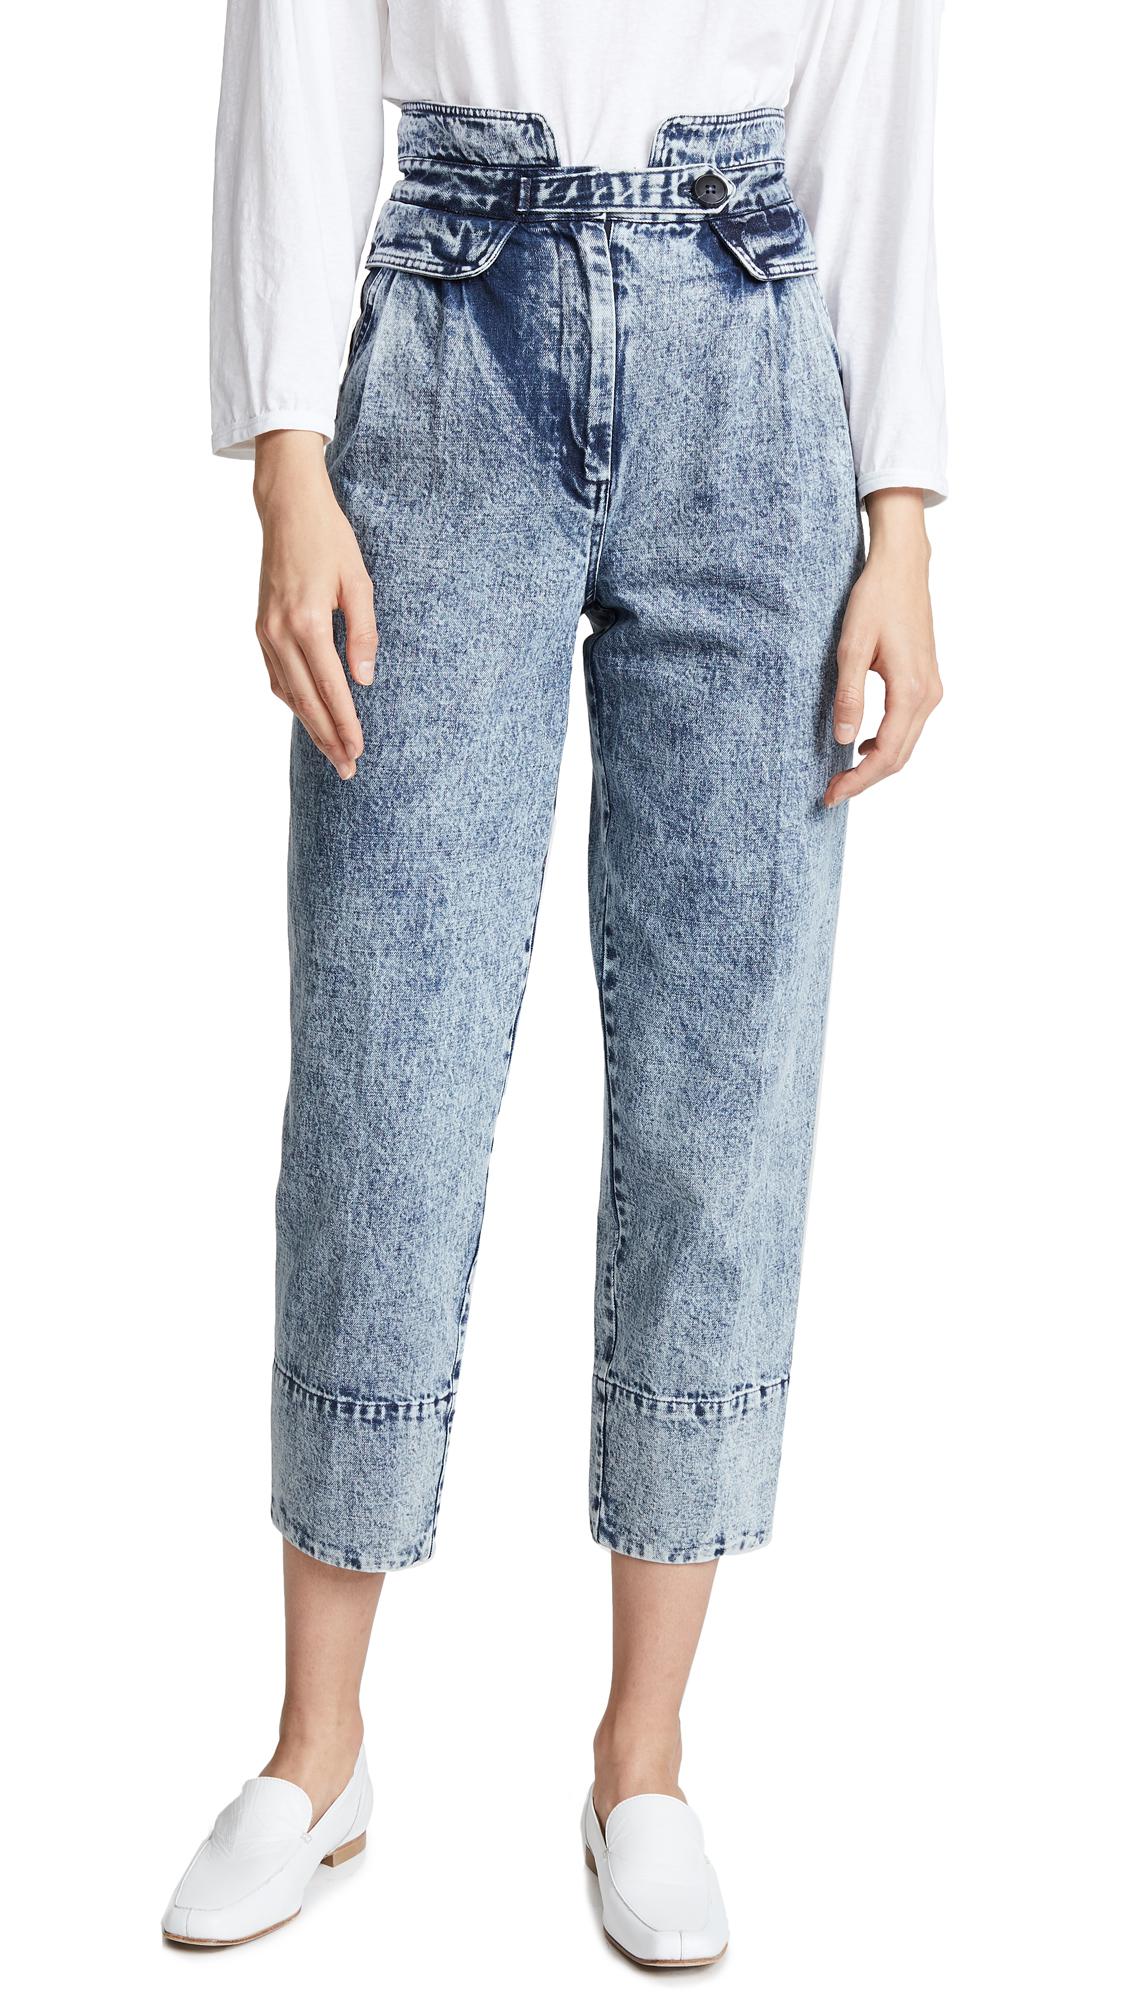 Sea Jocelyn Acid Wash Jeans